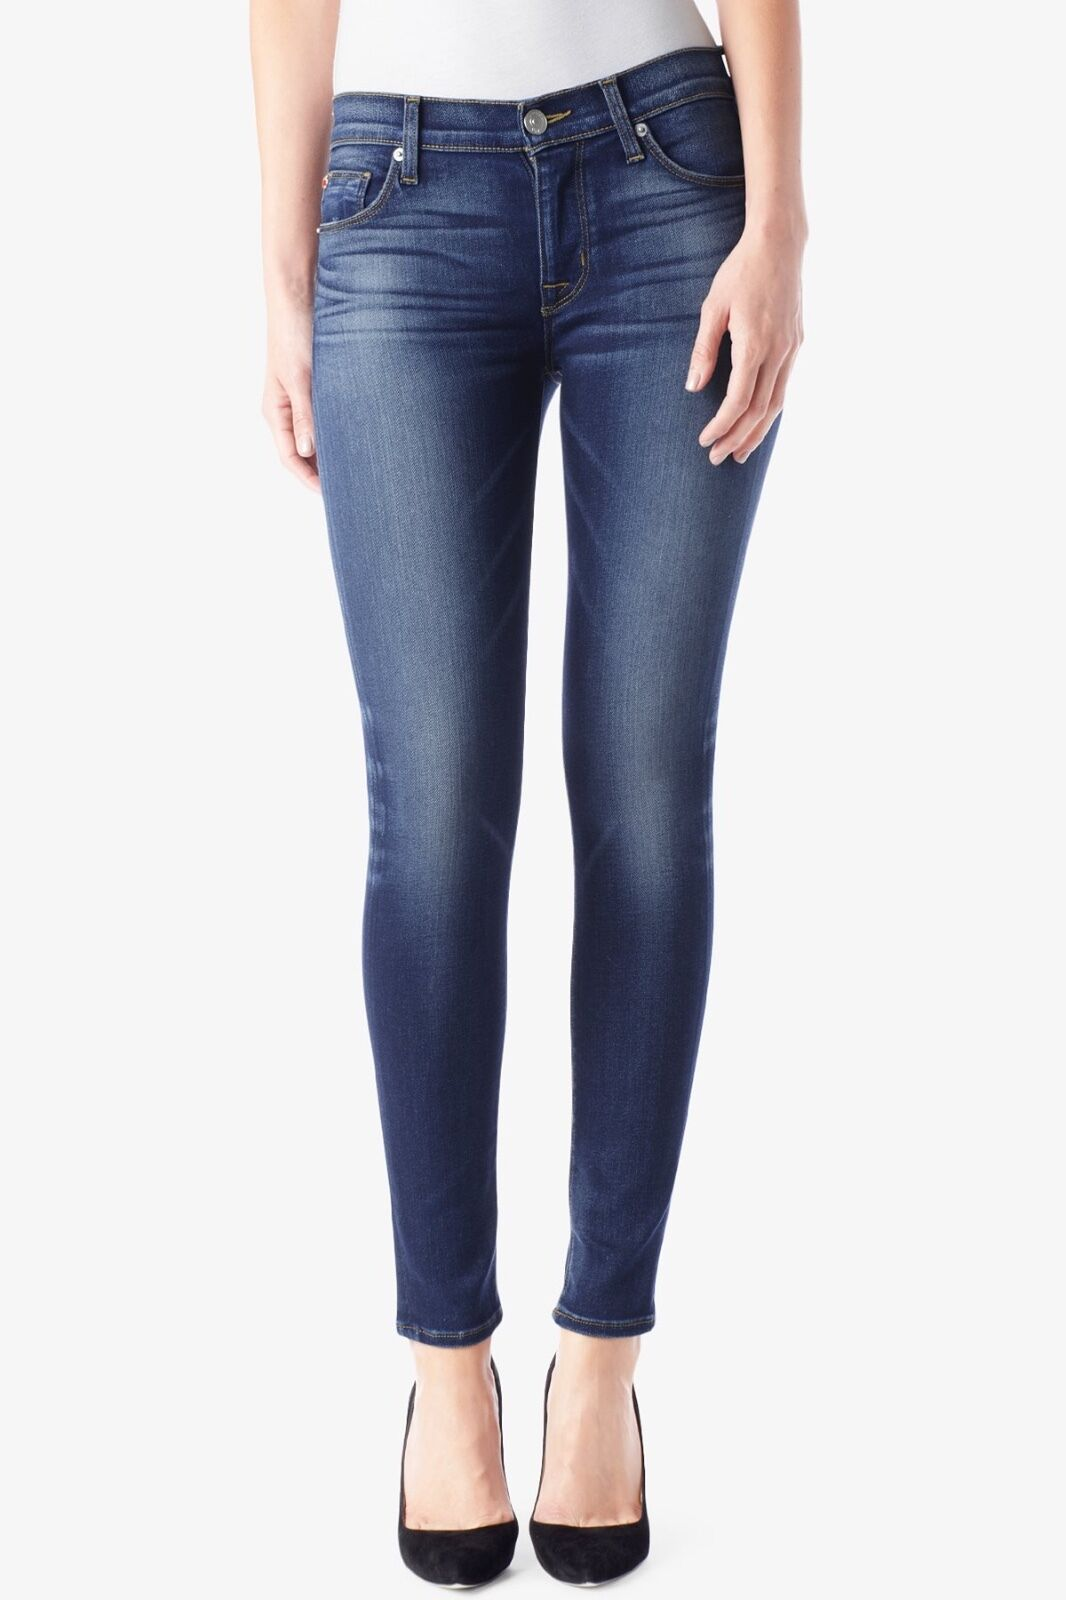 Hudson Nico Midrise Super Skinny Jeans 24 25 WM407DED BGLO